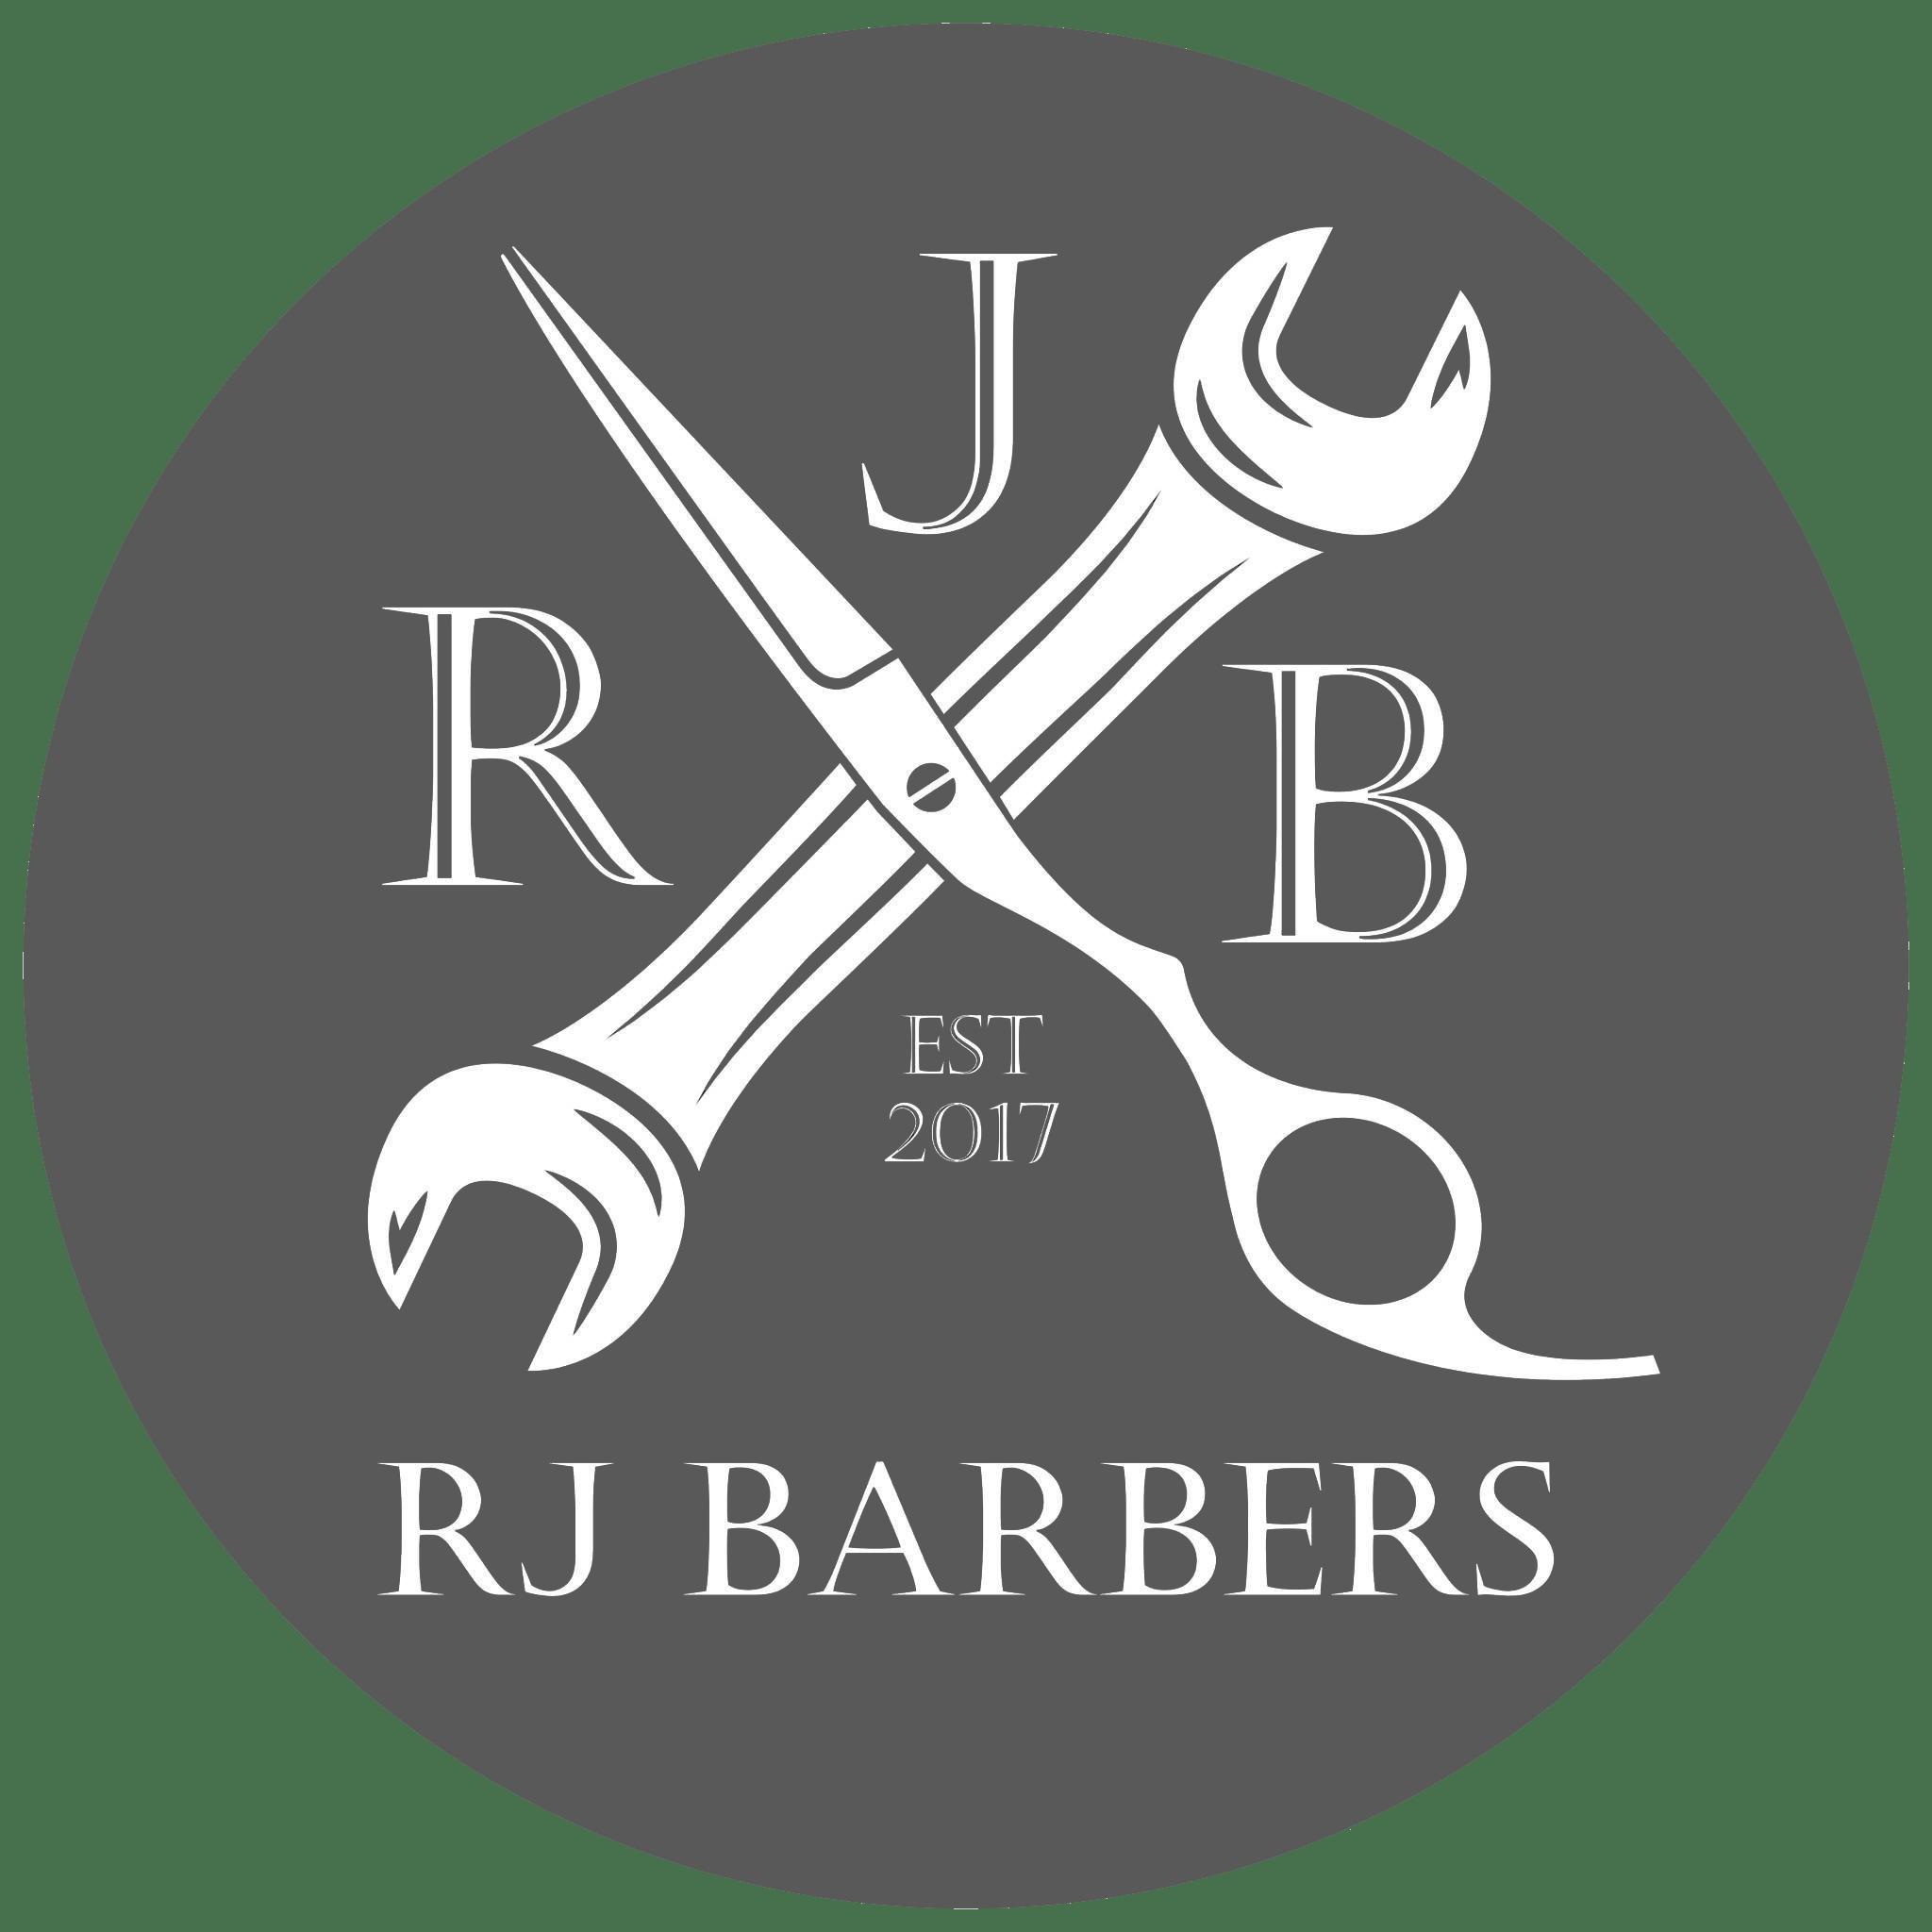 rjbarbers.co.uk